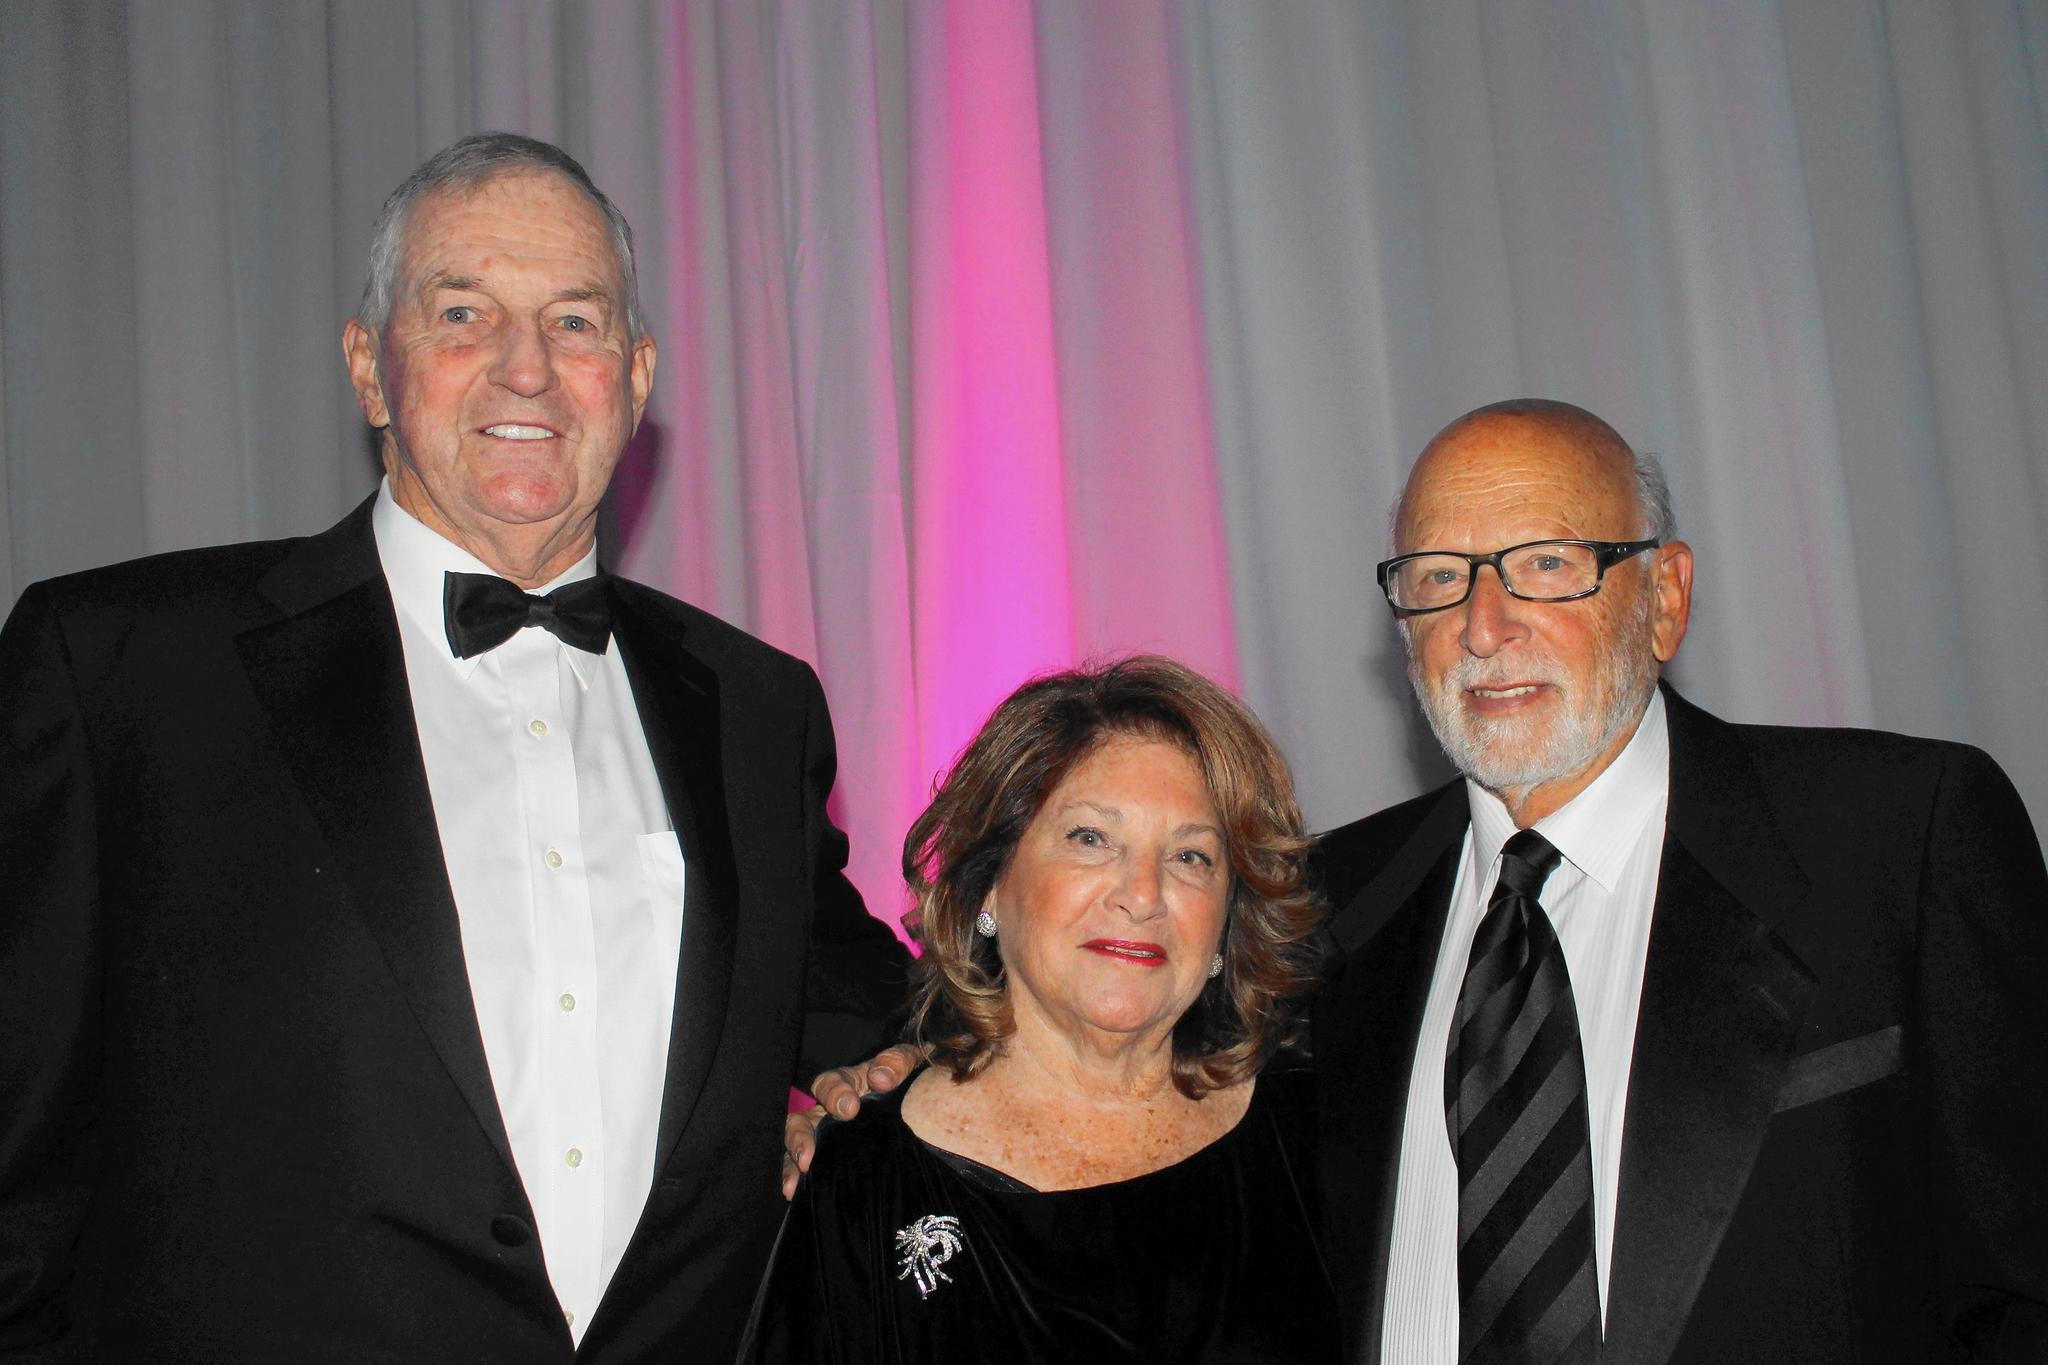 UConn White Coat Gala Celebrates Center On Aging - Hartford Courant